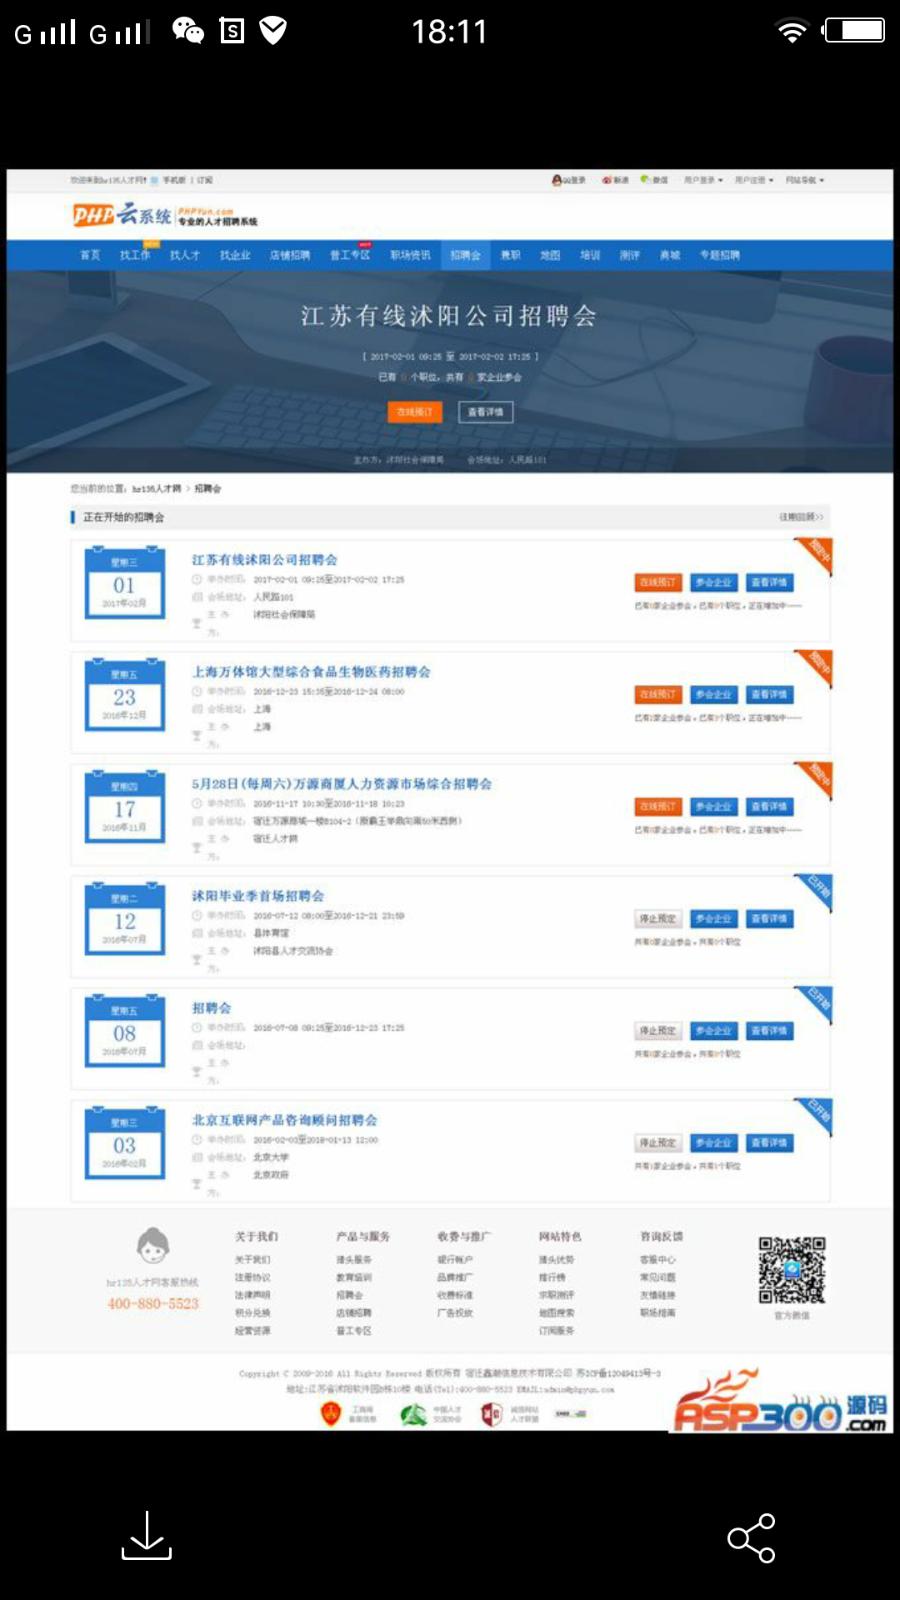 PHPYUN人才招聘网站源码4.2商业版,PC+Wap+微信+微信支付+**+兼职招聘+展会功能